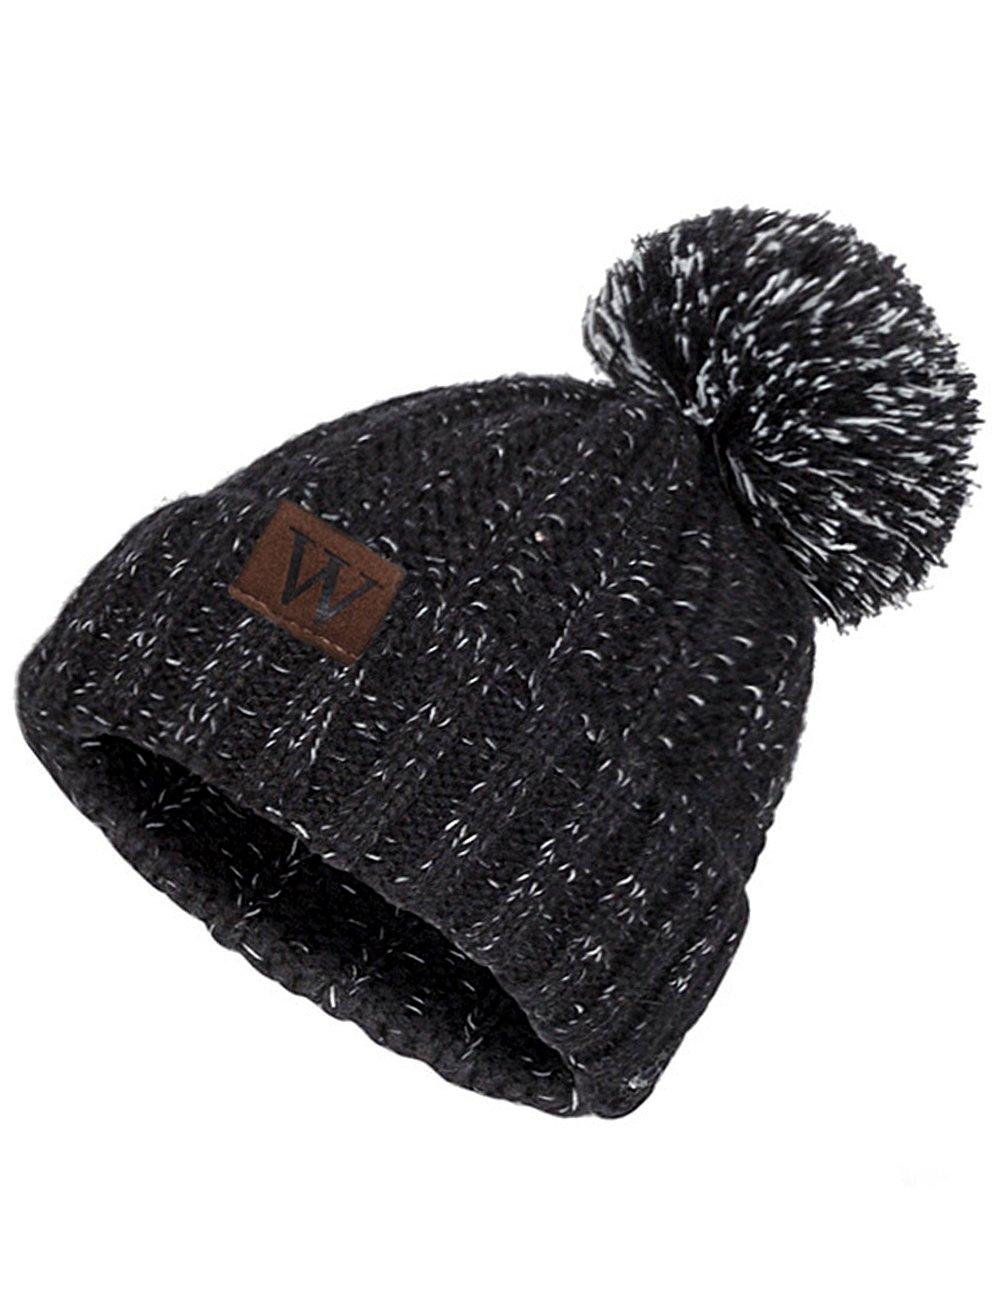 EVRFELAN Winter Fox Pompom Beanie Cable Knit Warm Hat Ribbed Ski Skull Cap (Black)